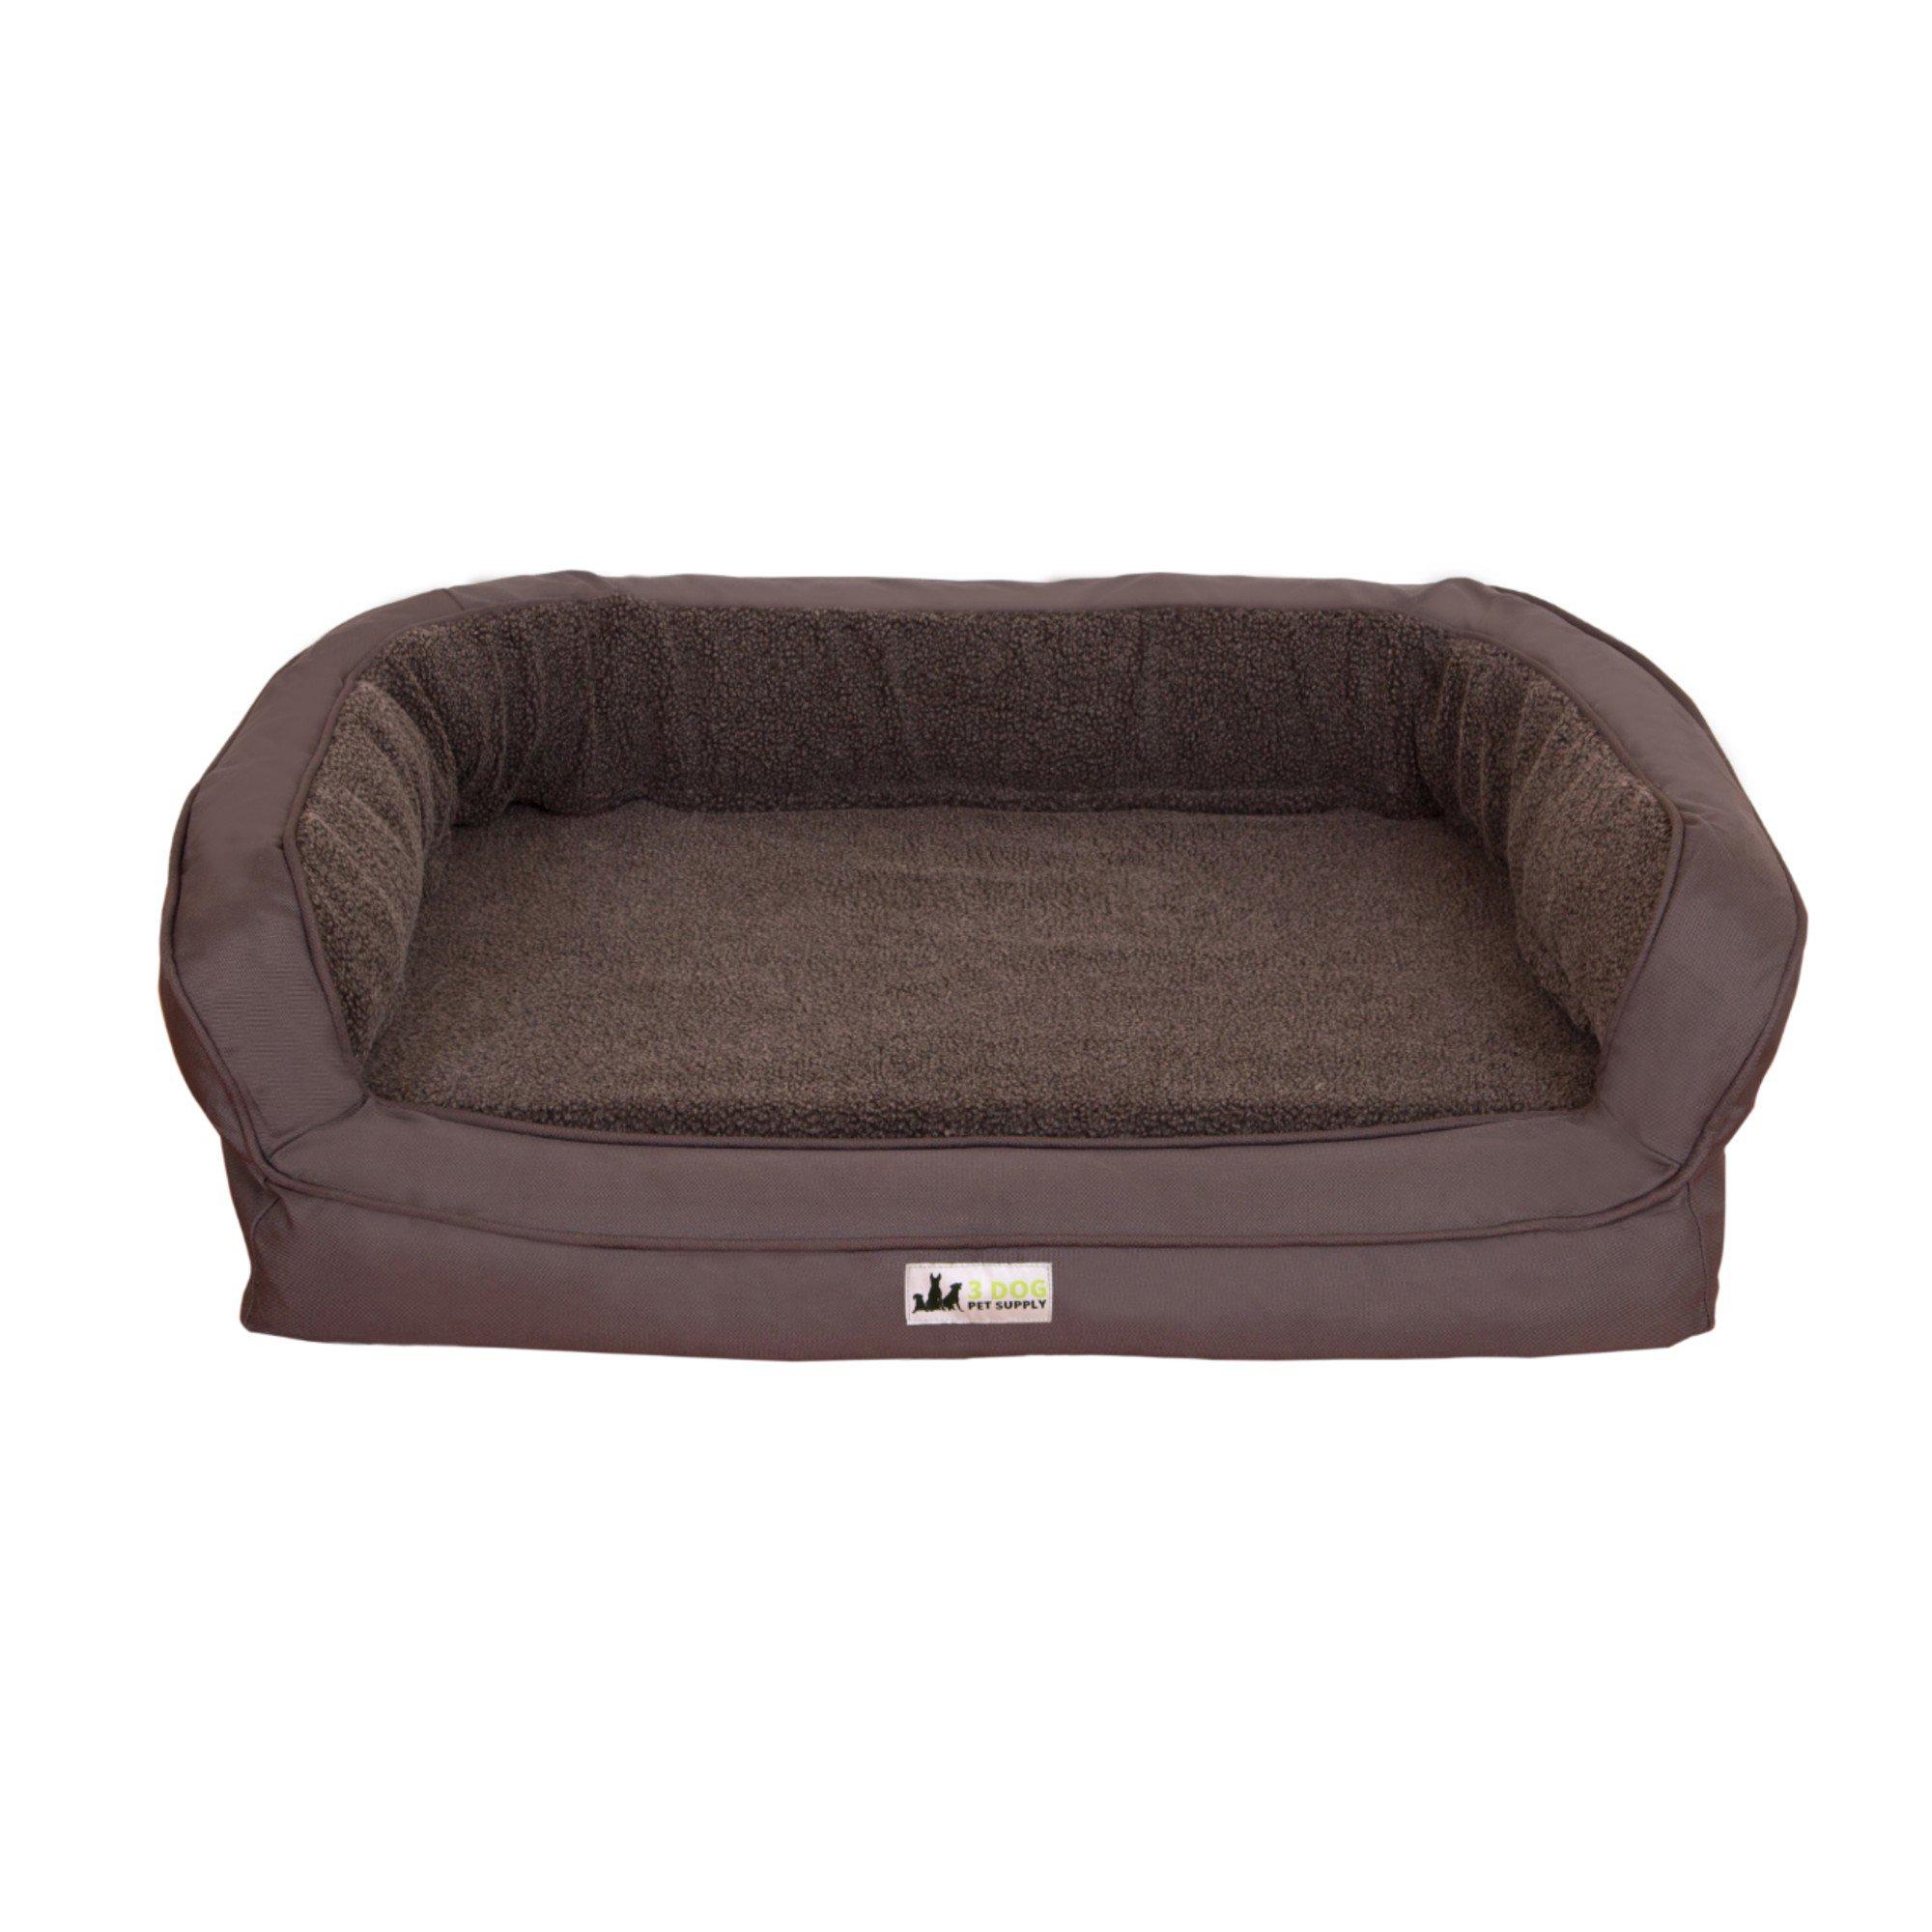 "3 Dog EZ Wash Fleece Bolster Grey Dog Bed, 38"" L X 26"" W X 10"" H, Medium"